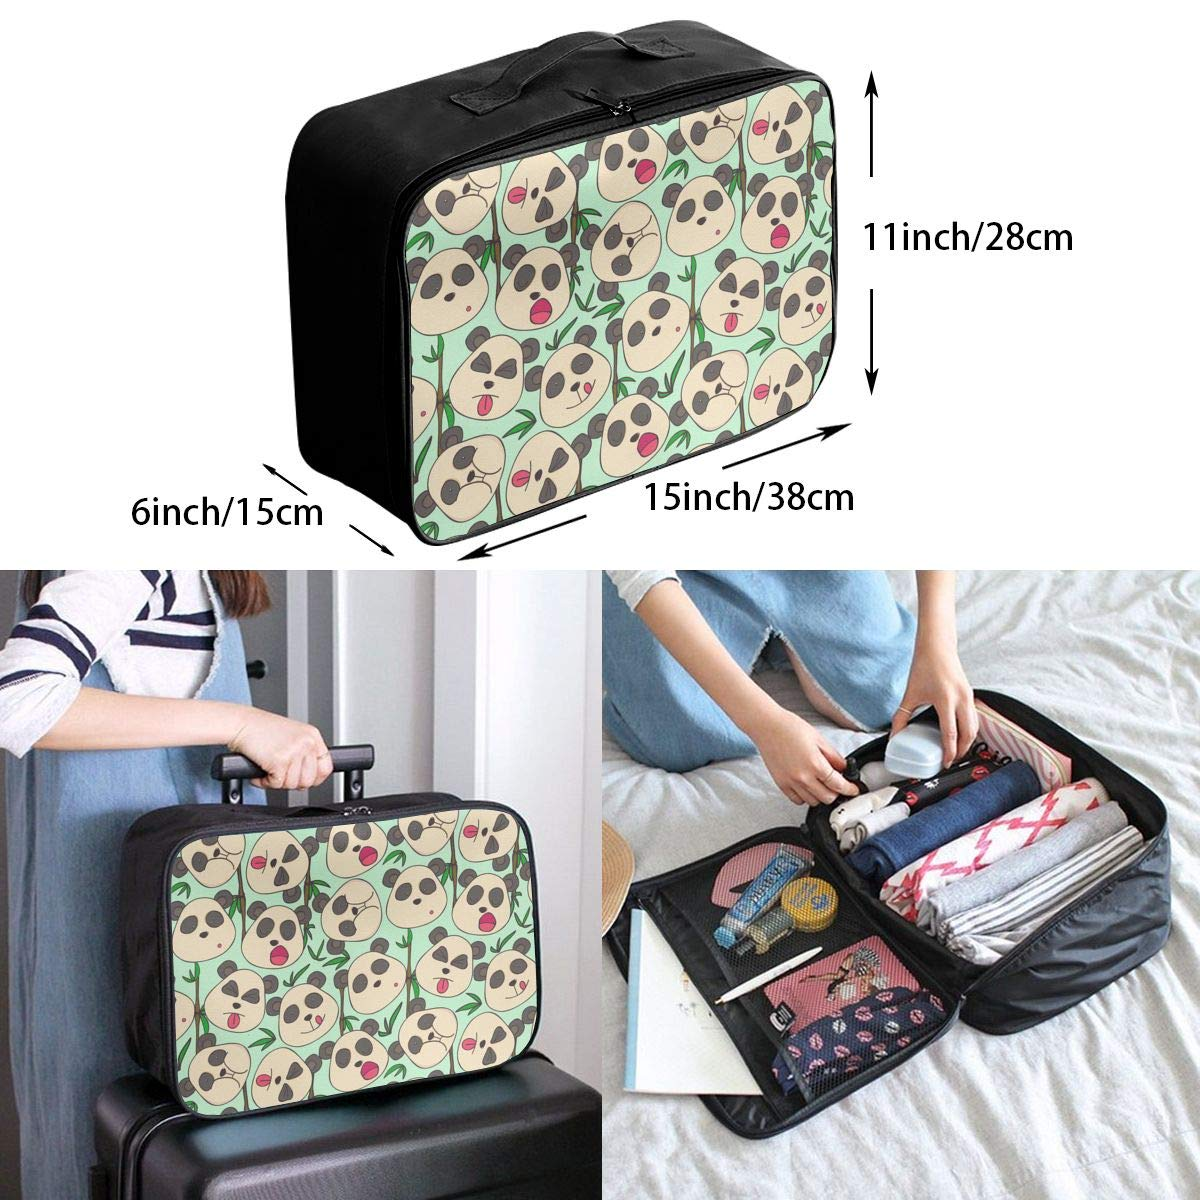 Travel Duffel Bag Waterproof Fashion Lightweight Large Capacity Portable Luggage Bag White And Black Panda Patterns Green Bamboo